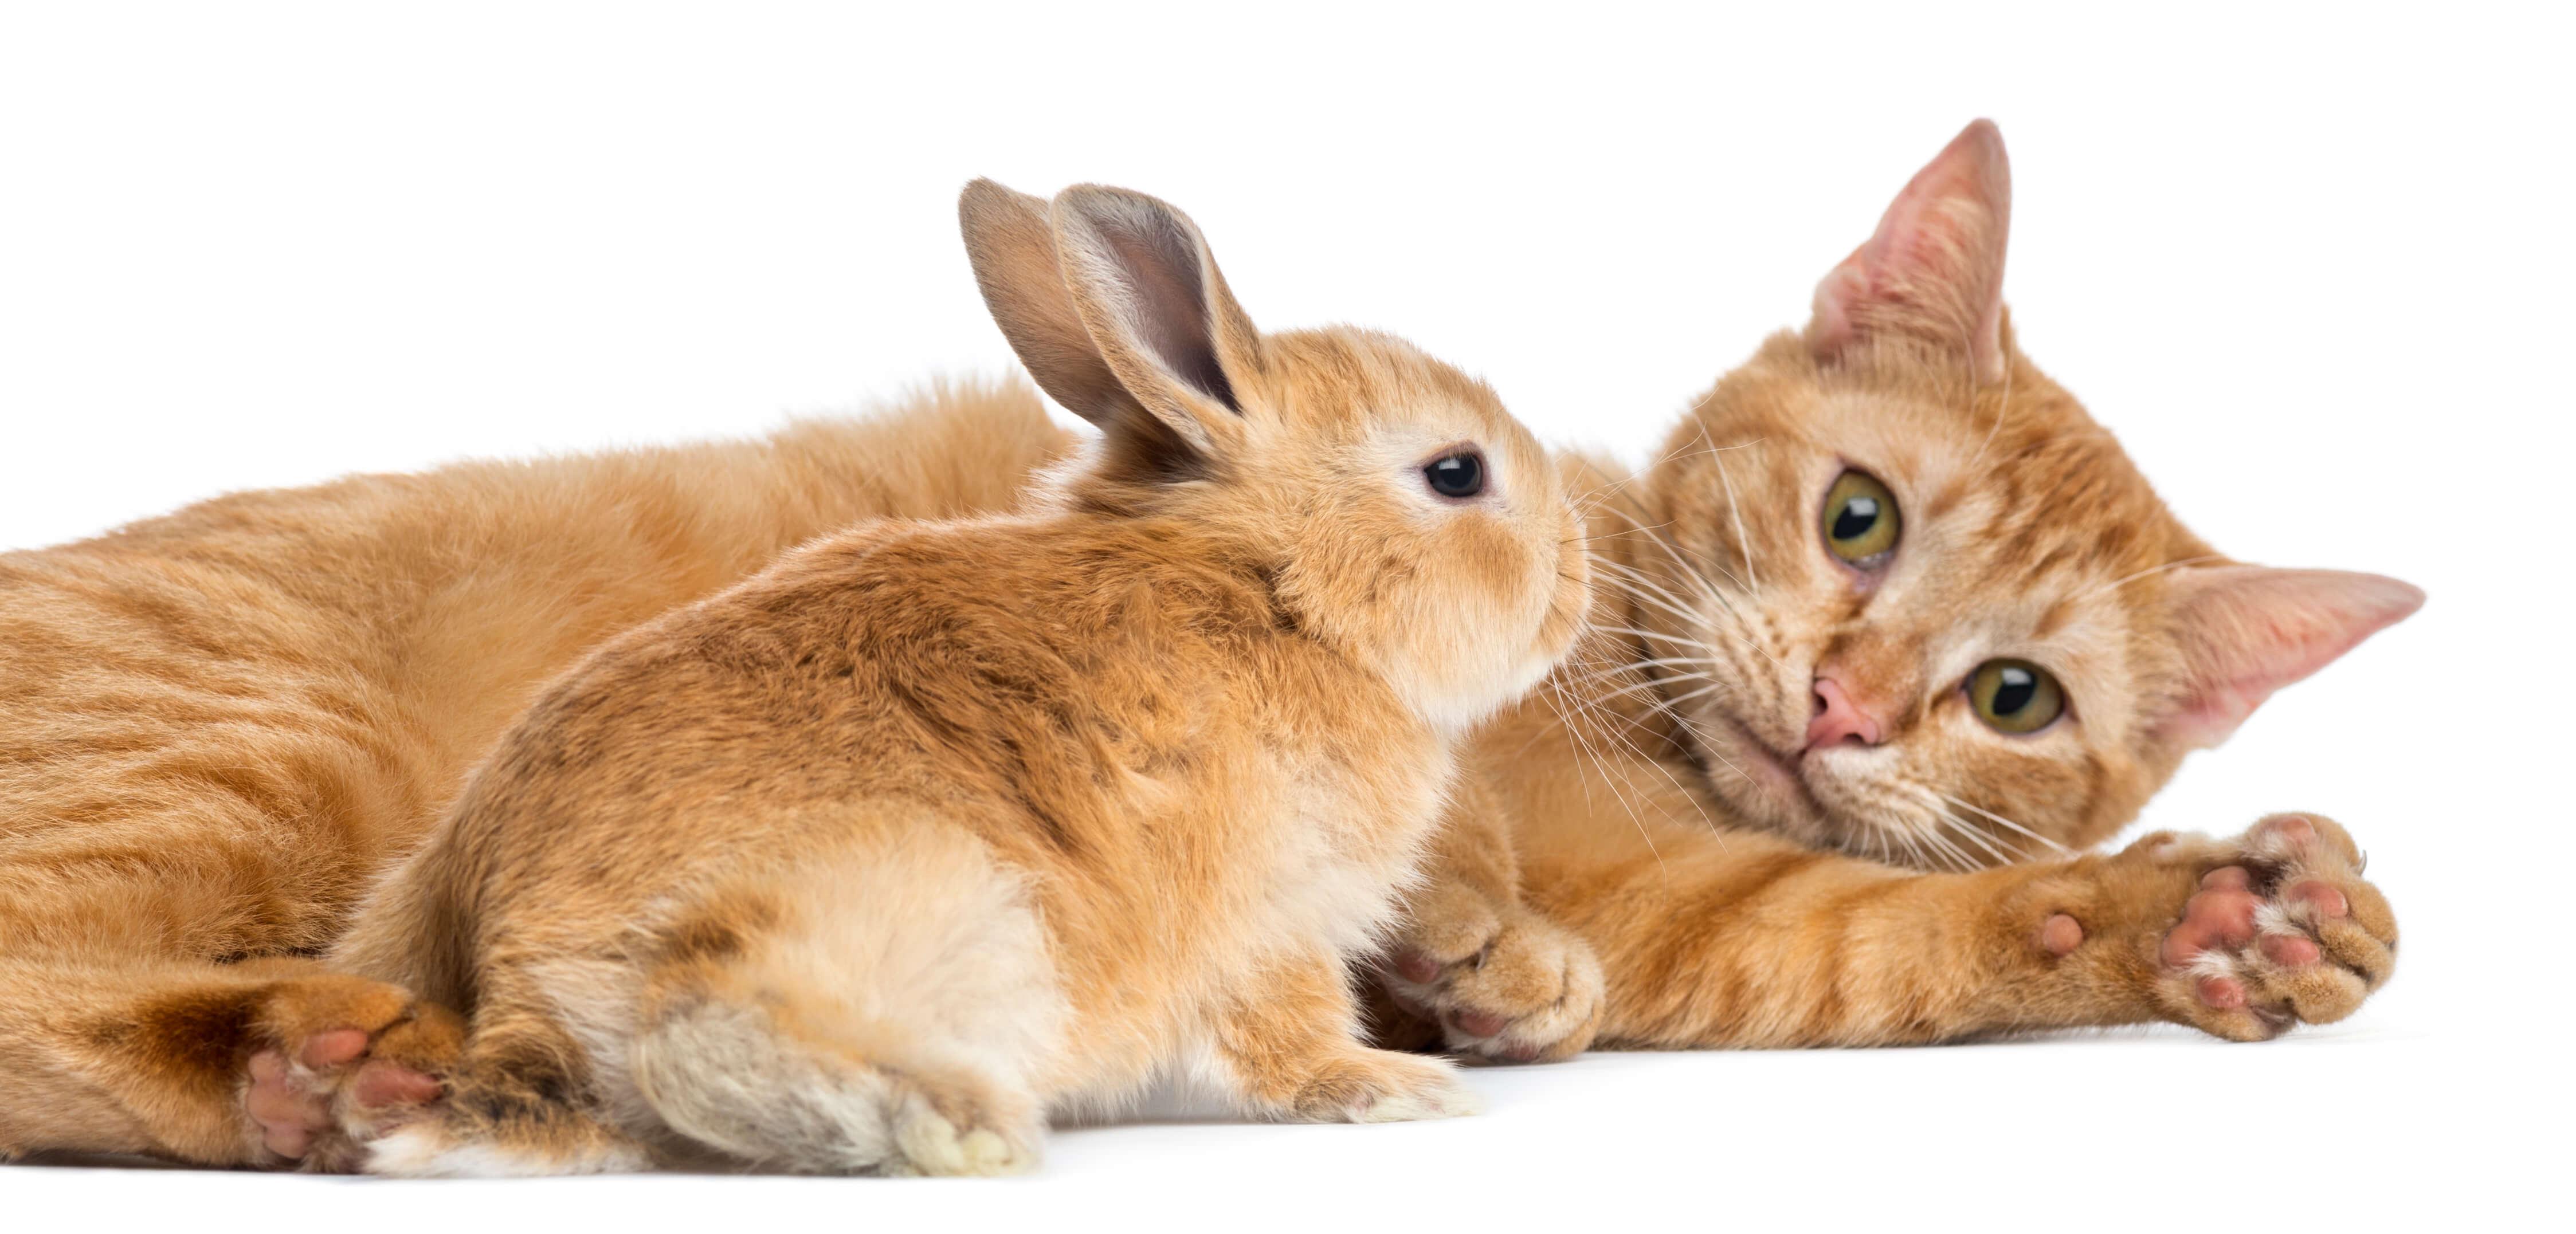 mascotas conejo enano